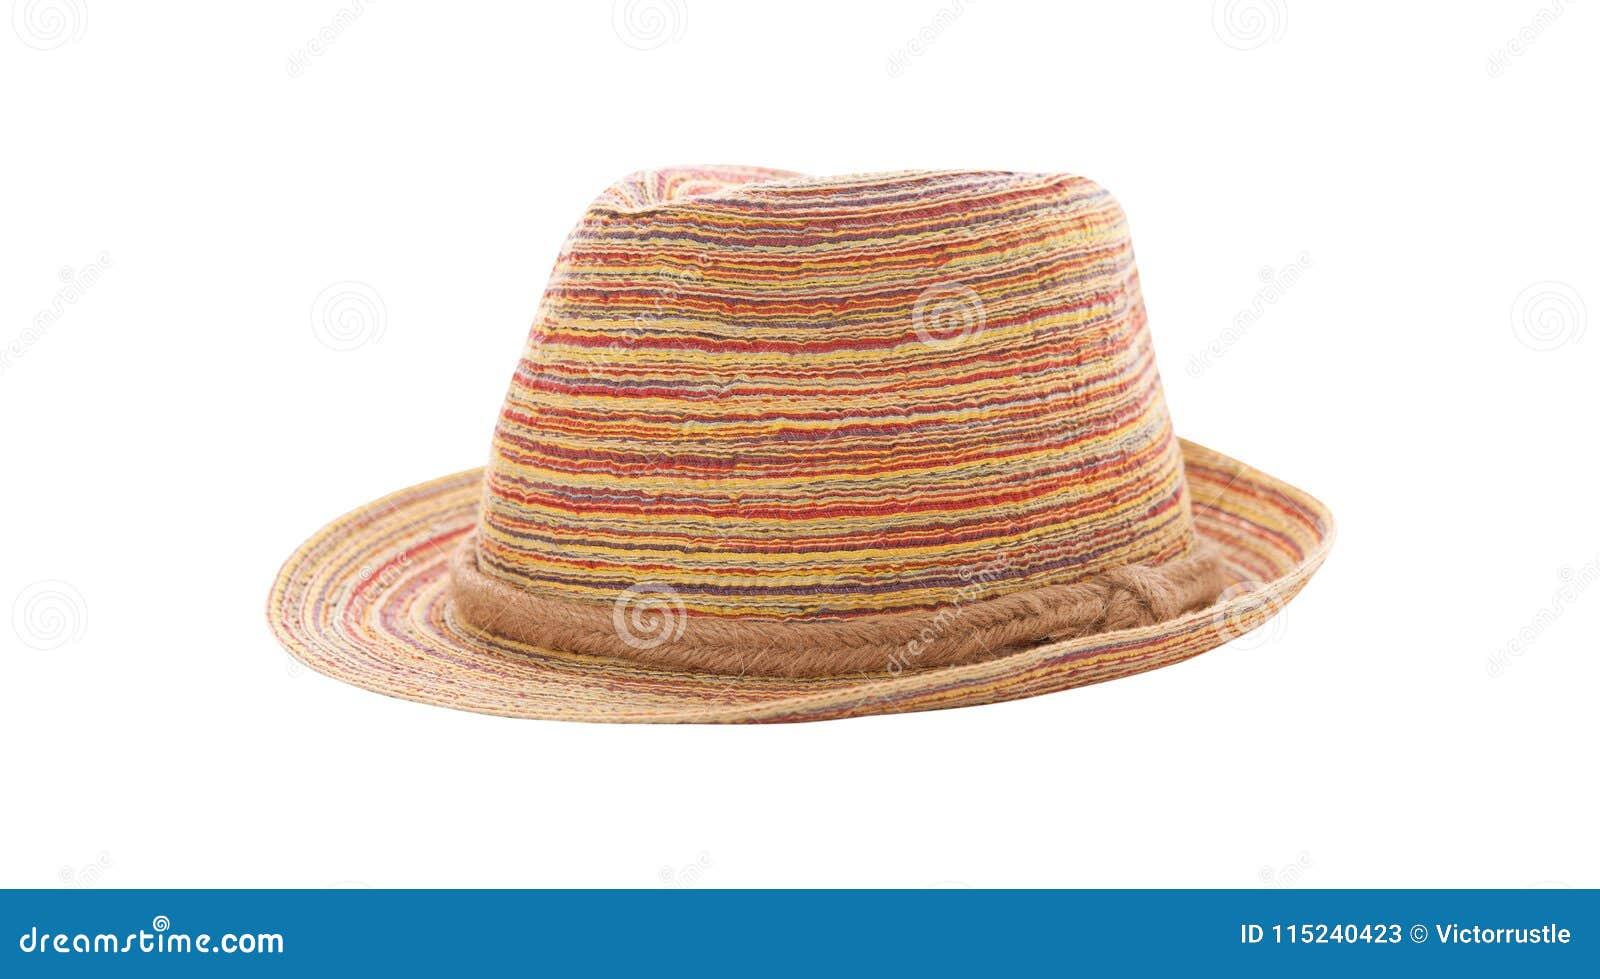 Chapéu De Palha Bonito Isolado No Fundo Branco d2826a804eb